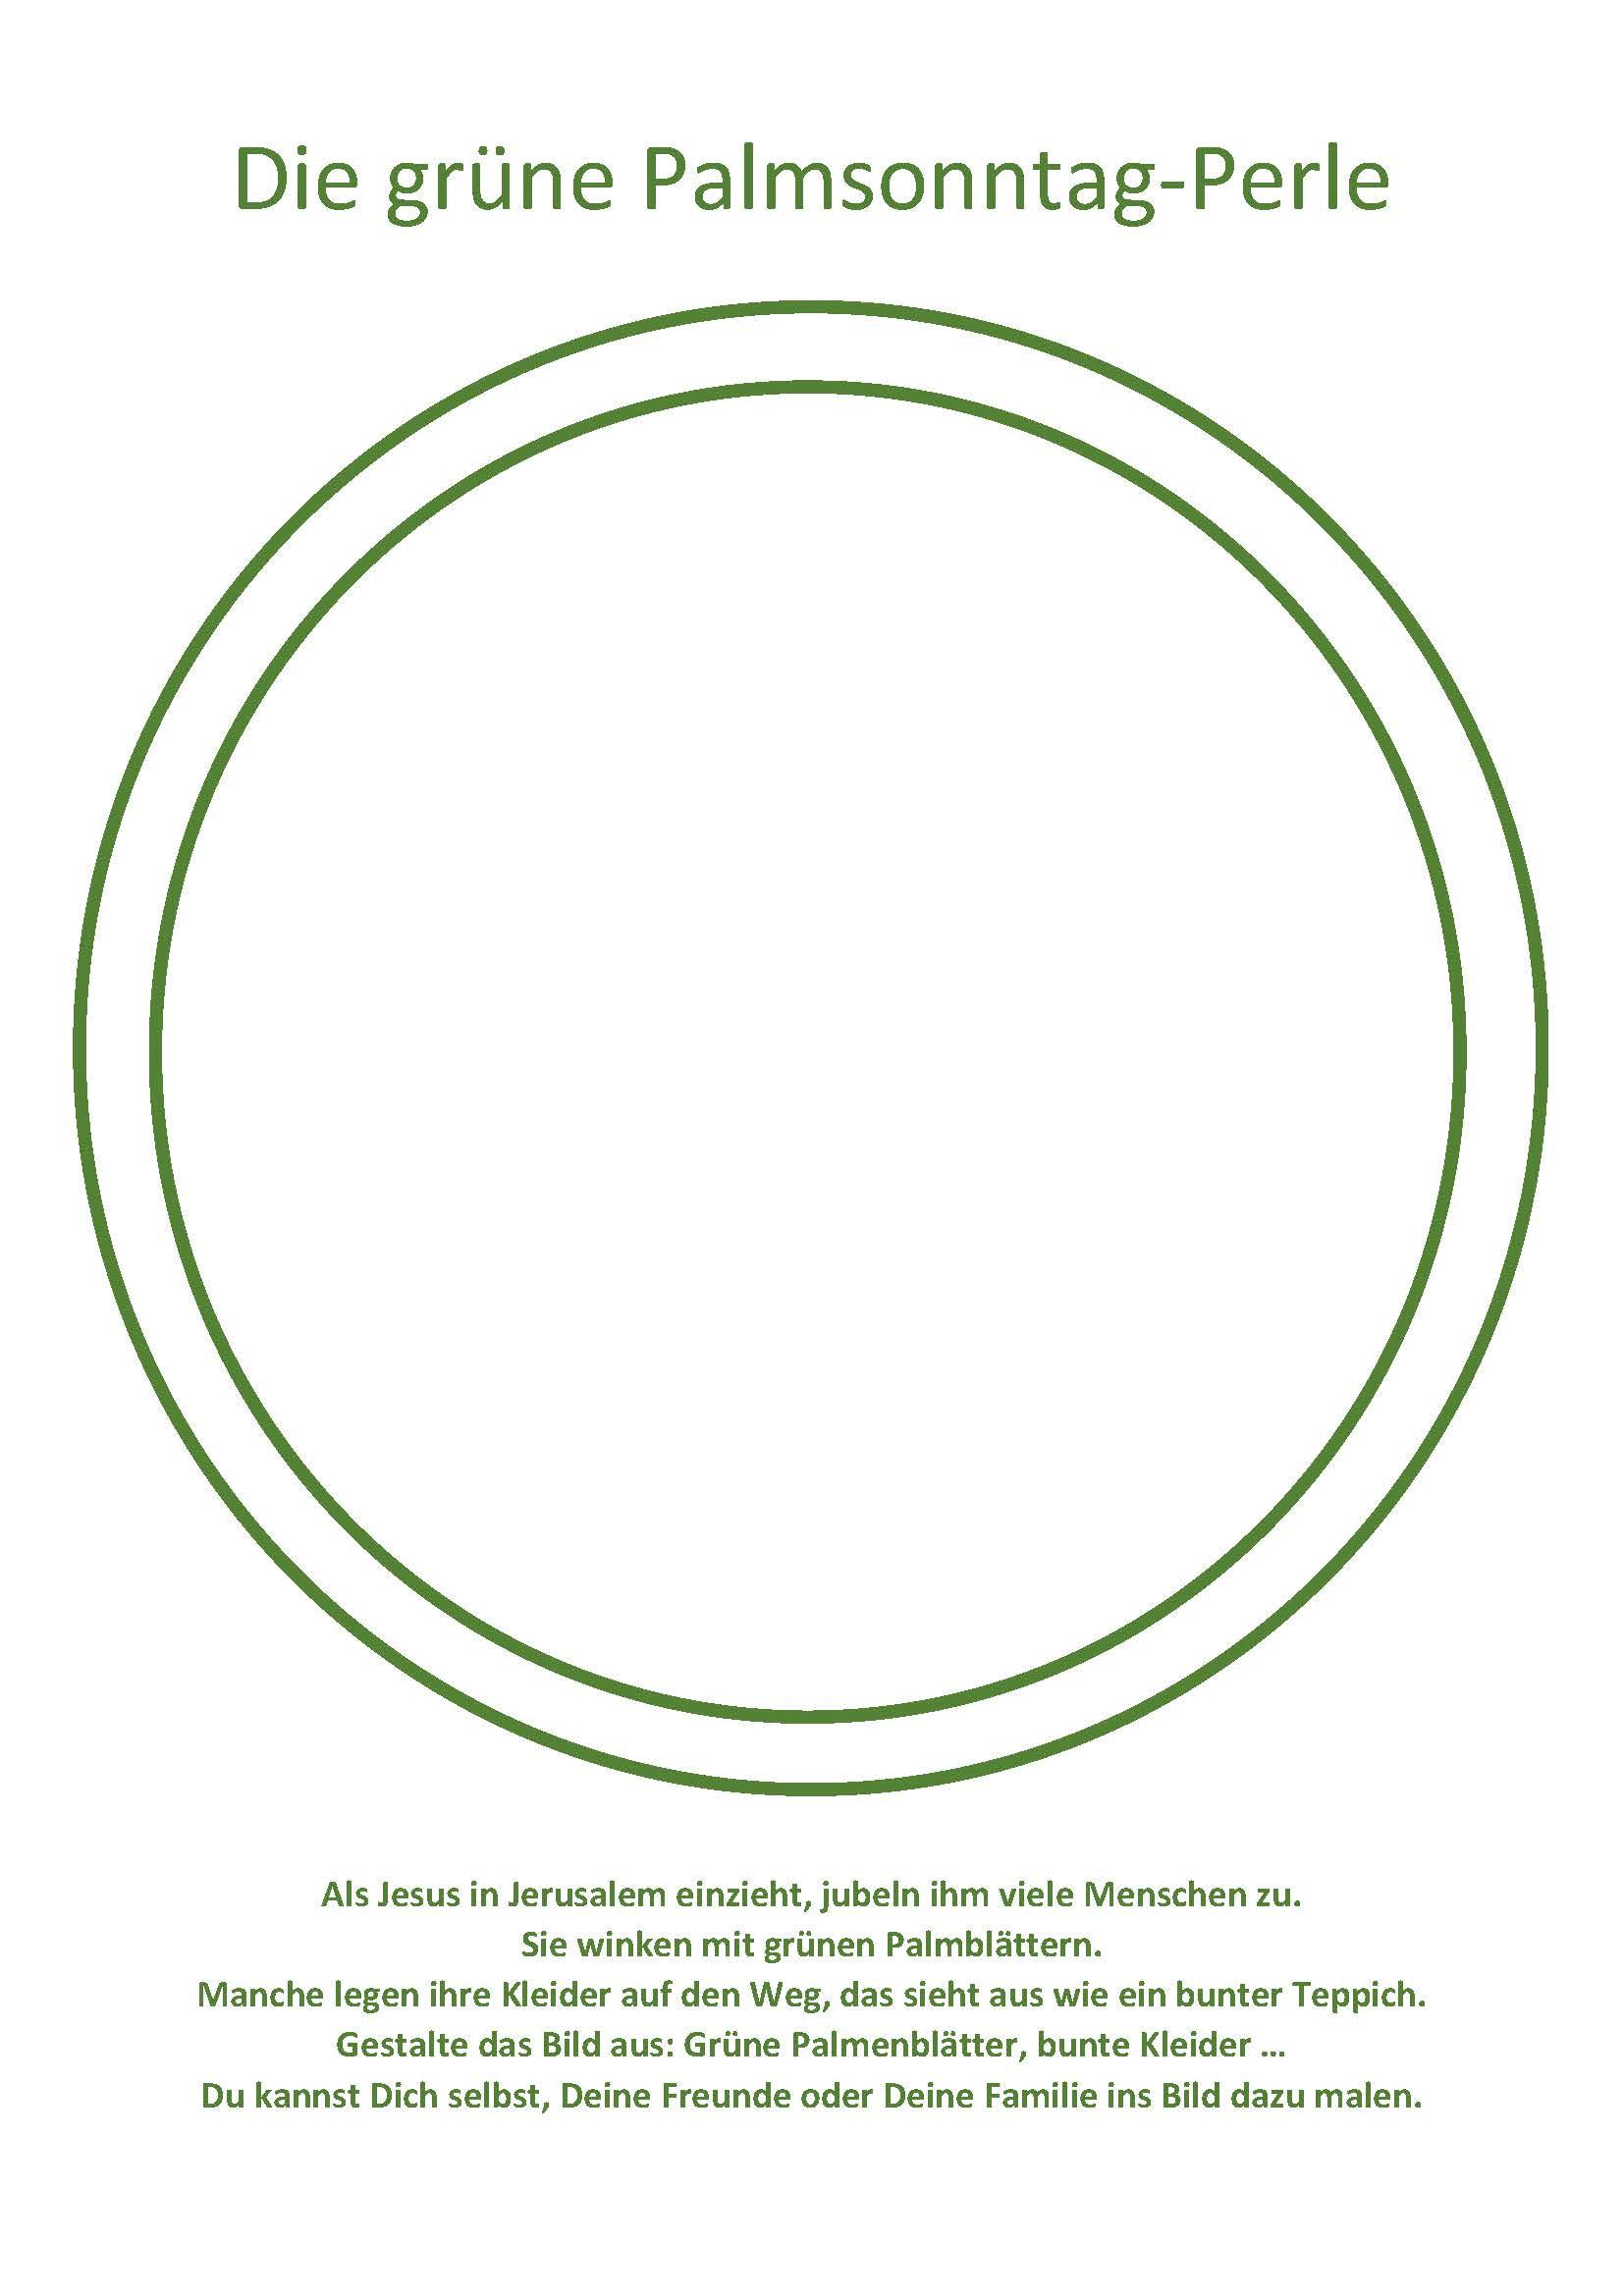 5 Grüne Palmsonntags-Perle - Malvorlage - Aktions-Seite Seelsorge in ...